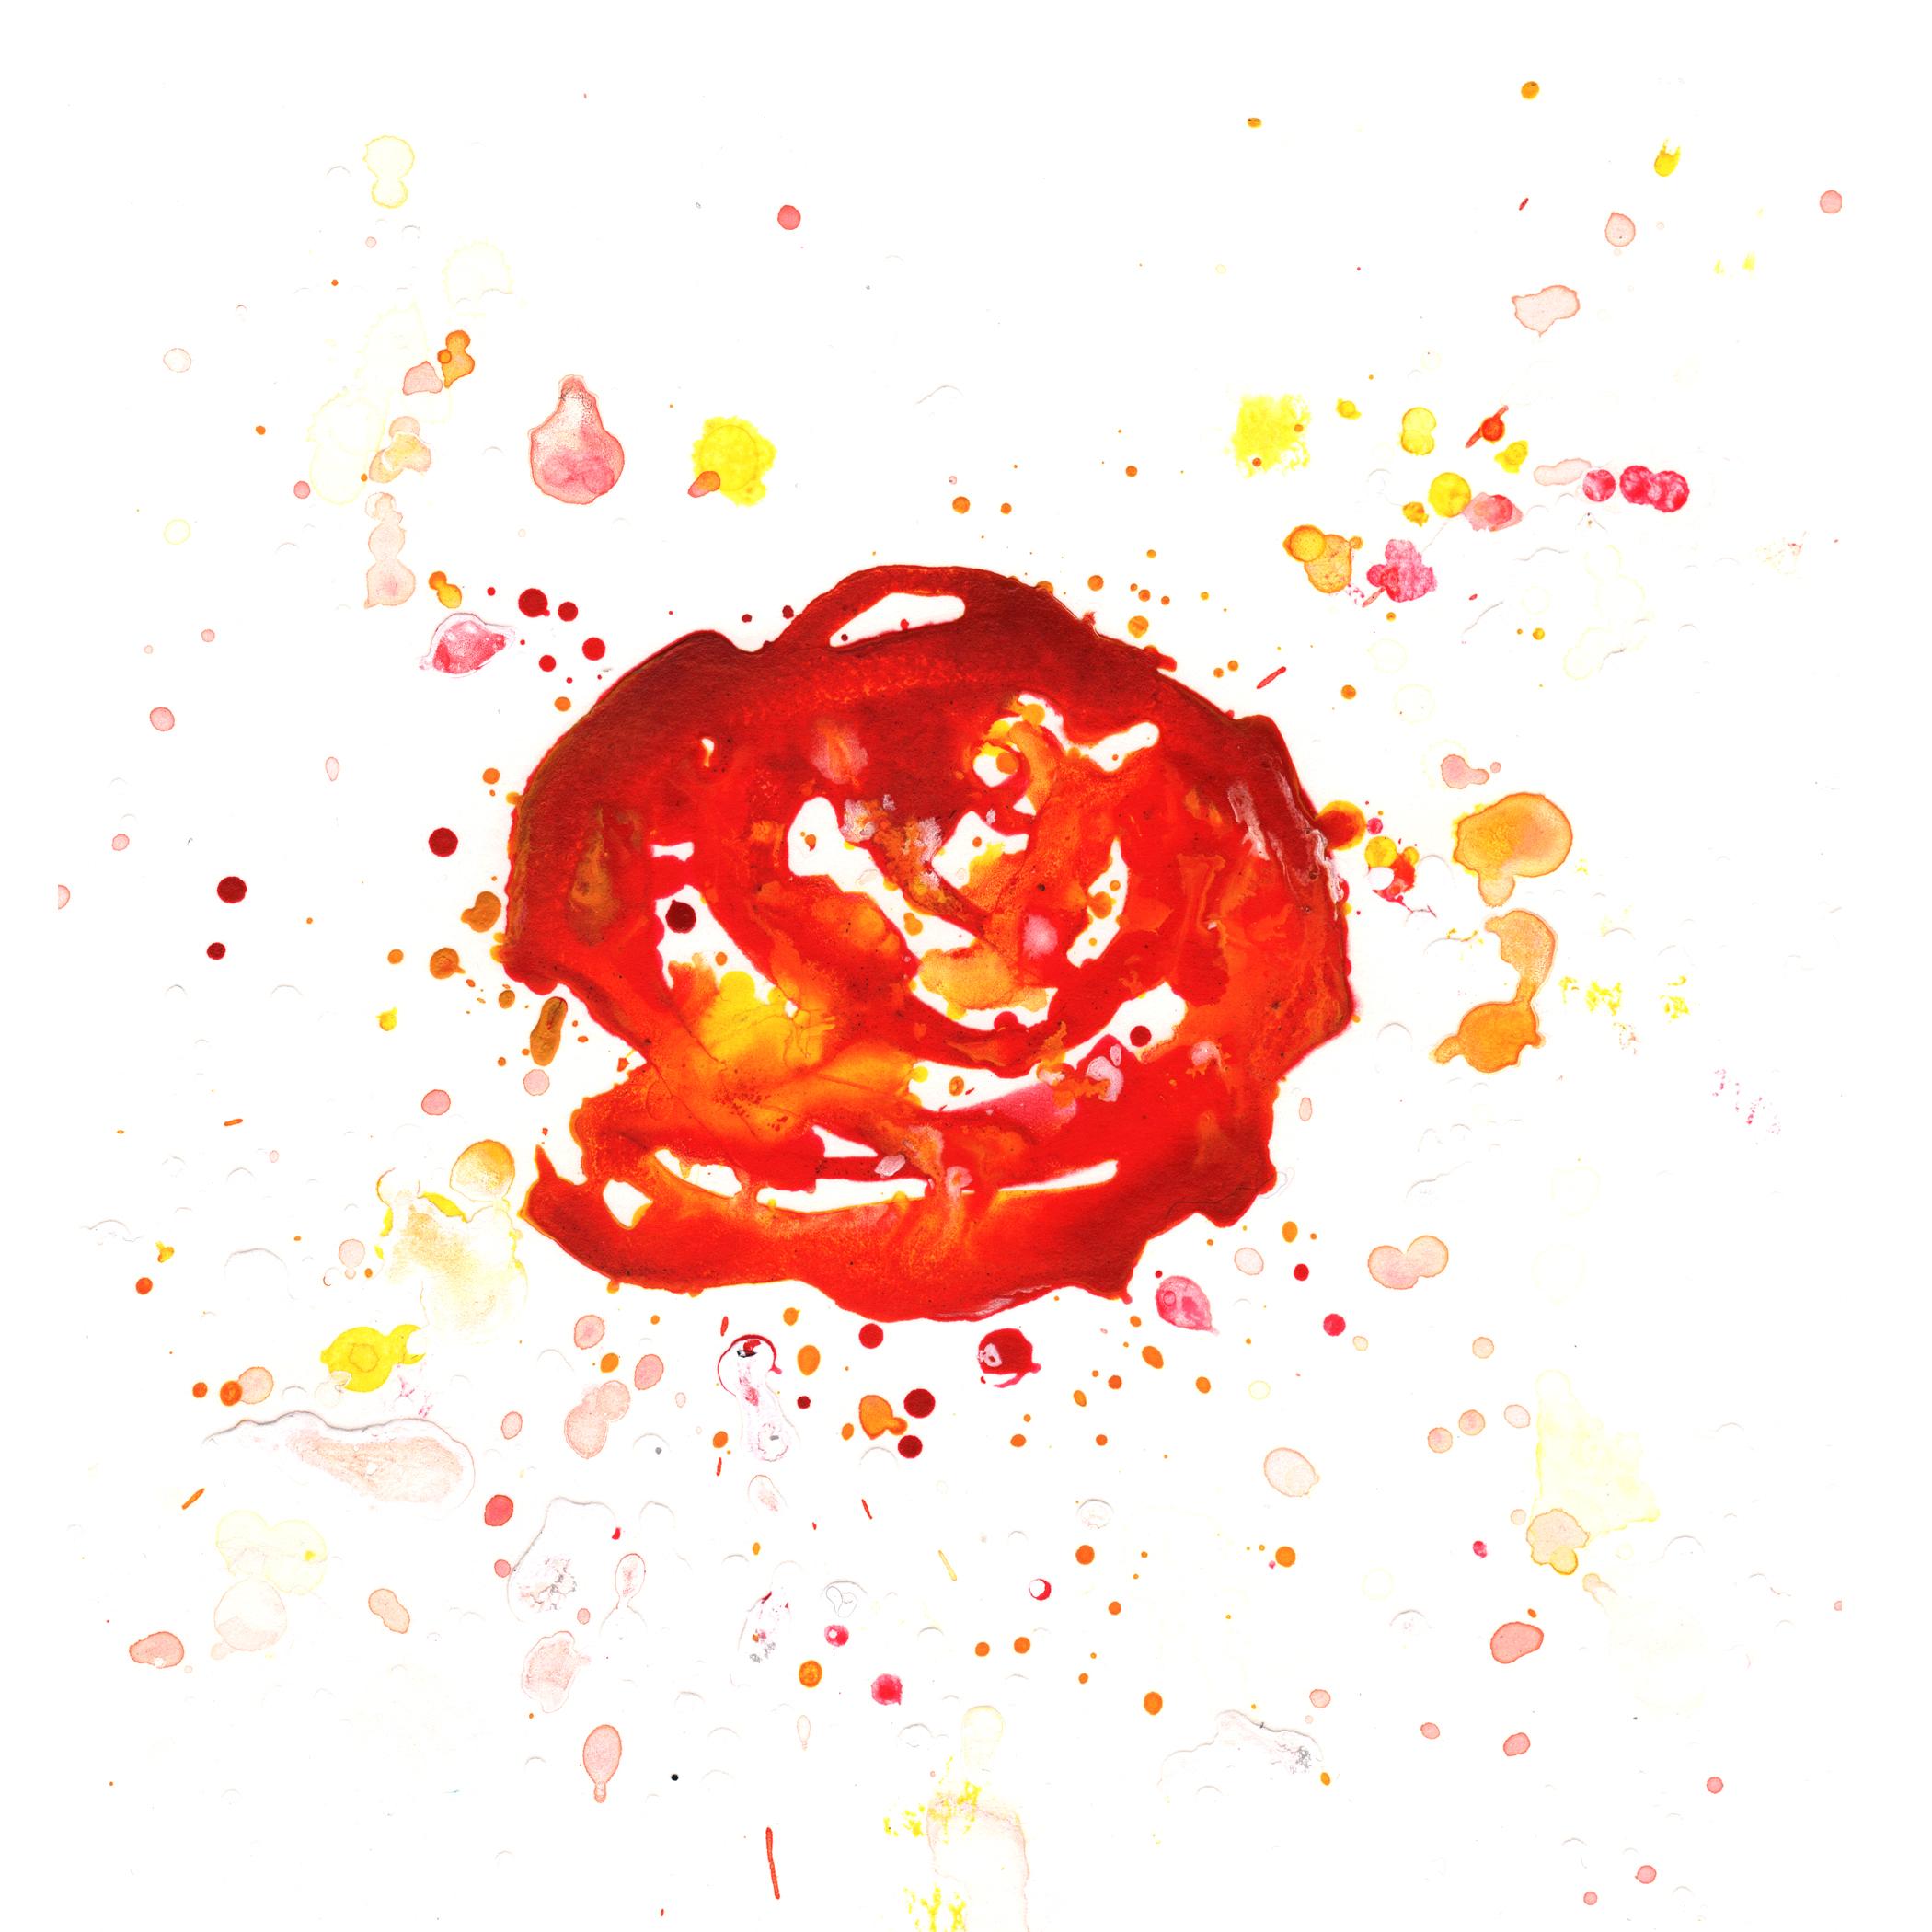 3.Orange.Rose.2.11.14.jpg